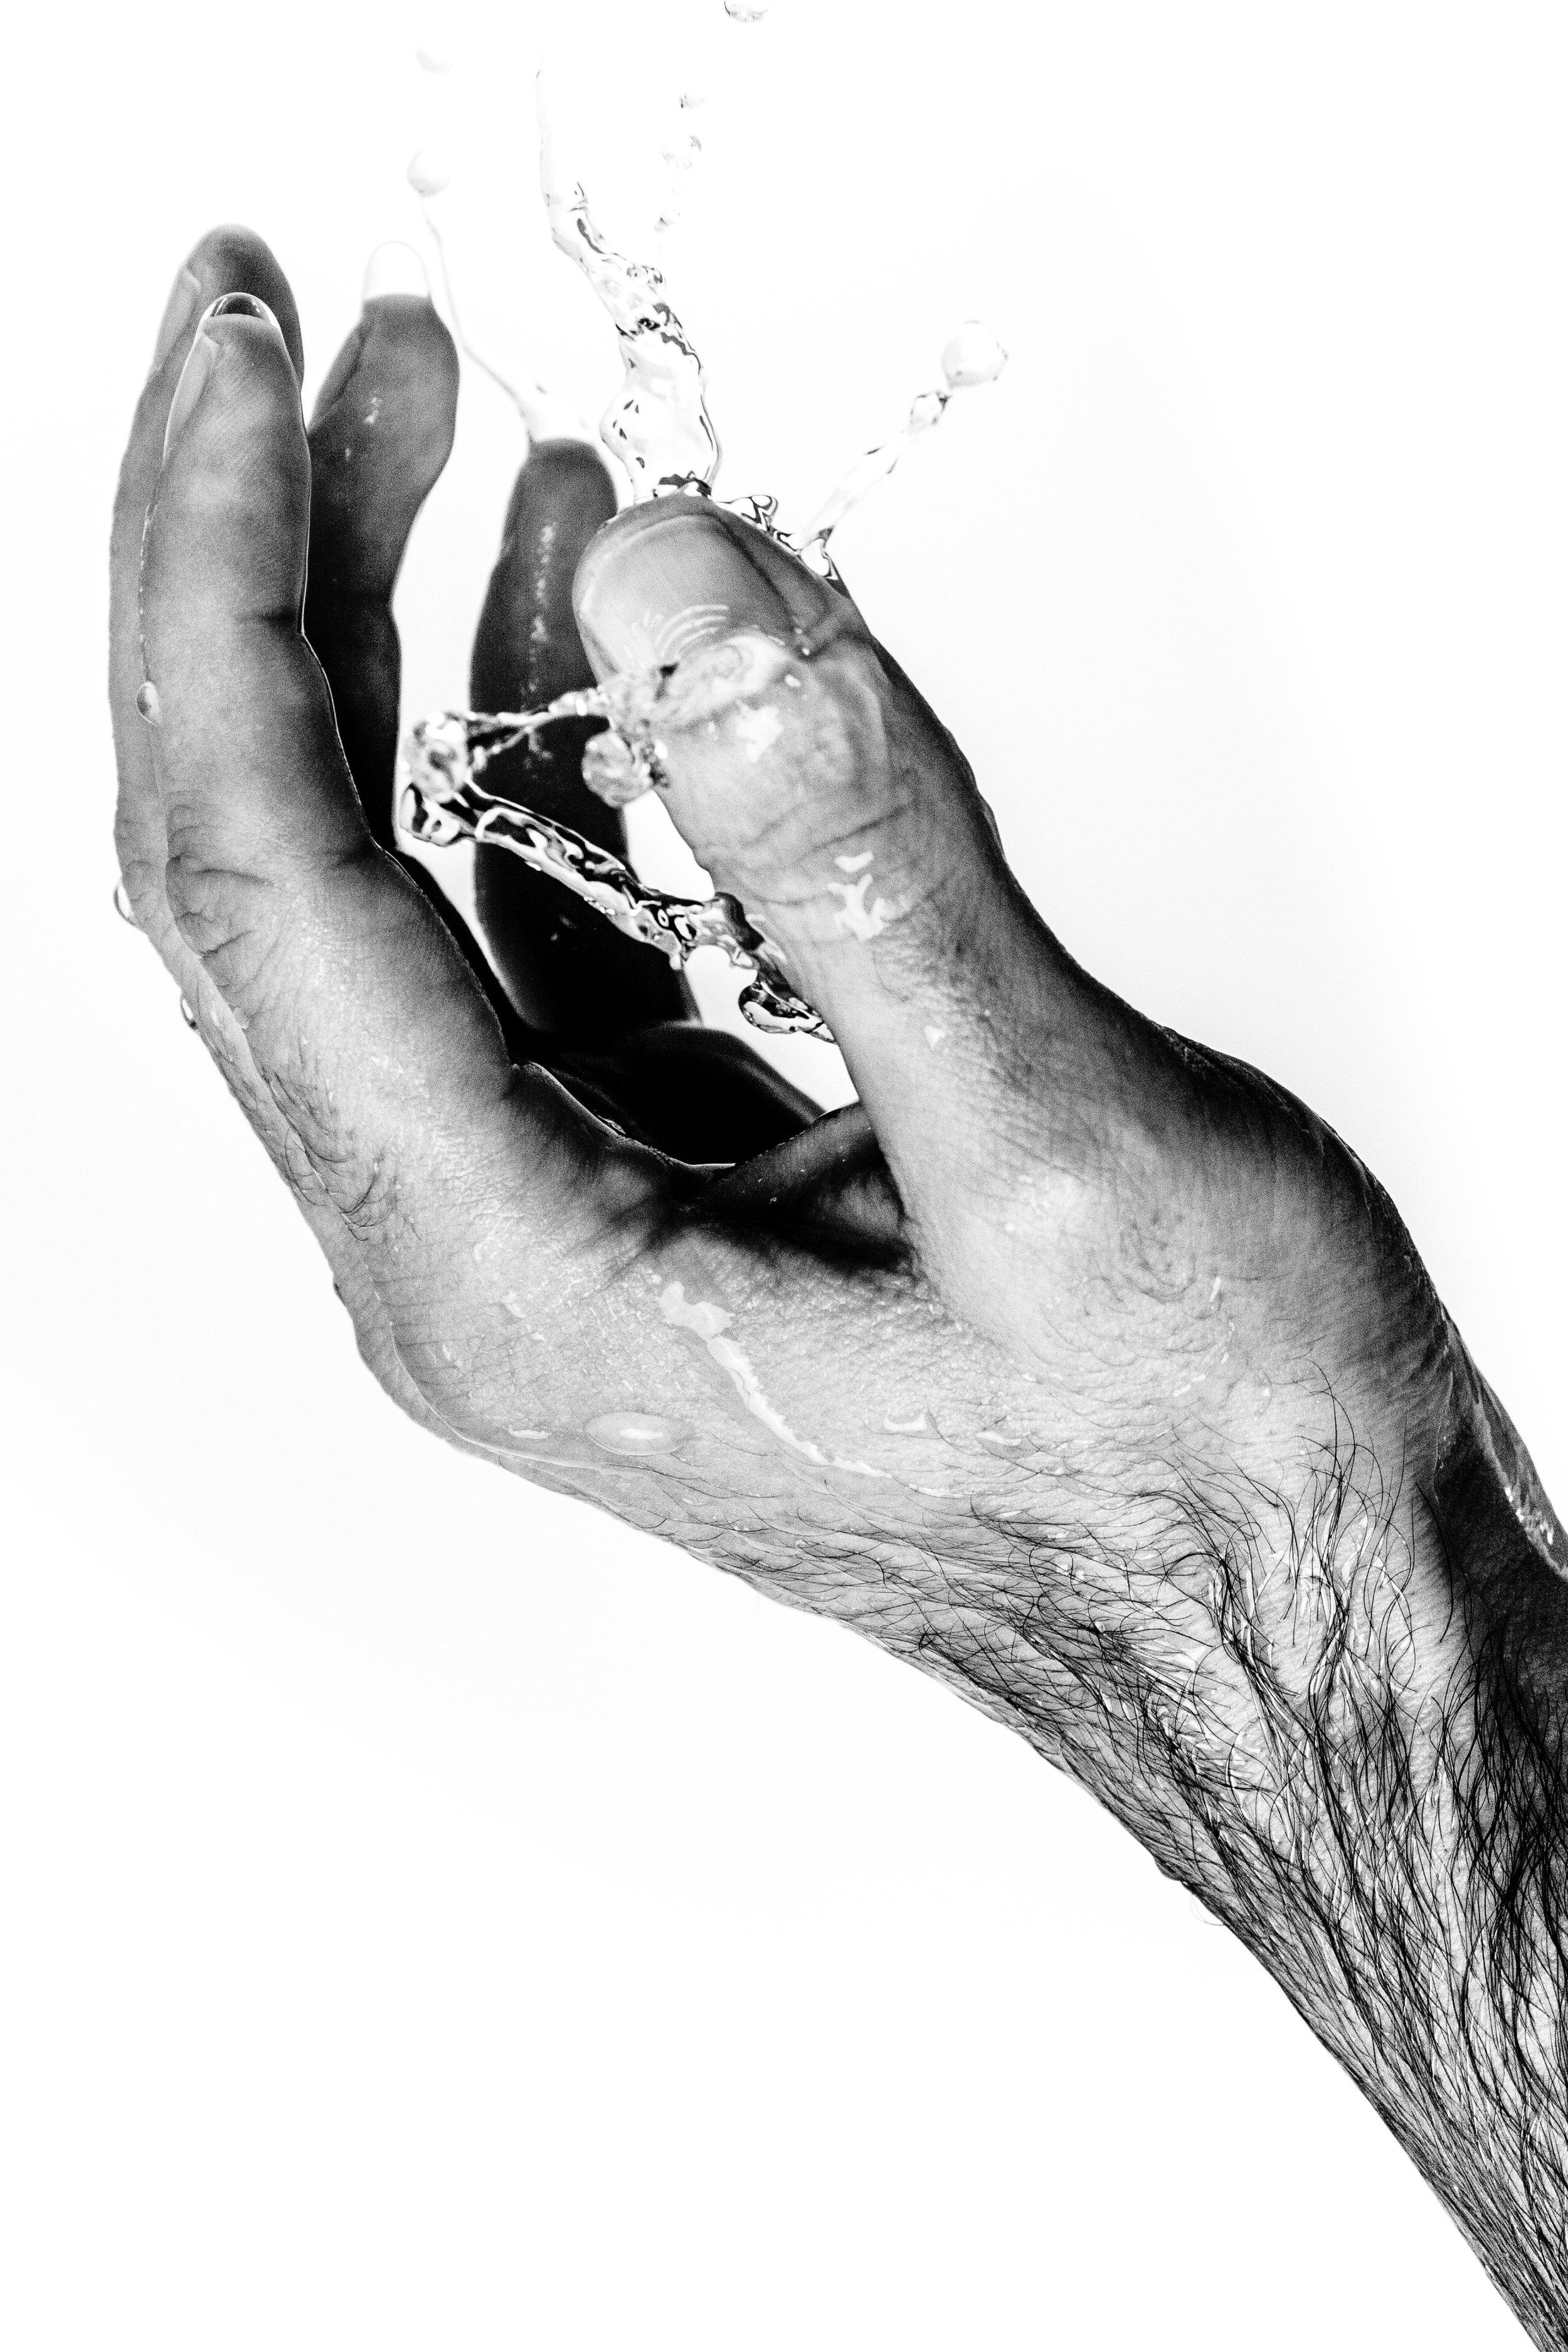 The_Hand_Water_Web-4.jpg